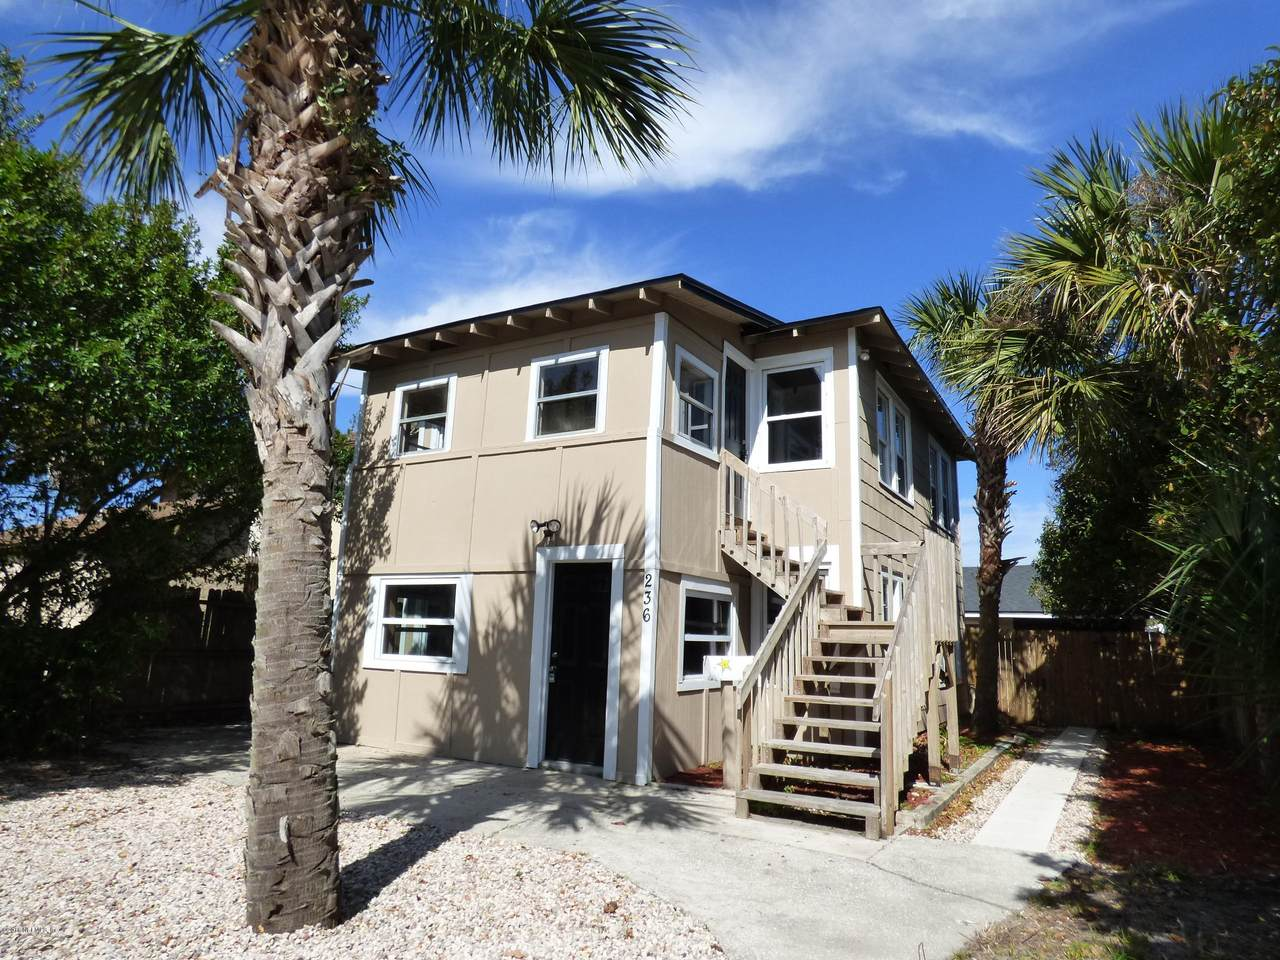 236 Florida Blvd - Photo 1